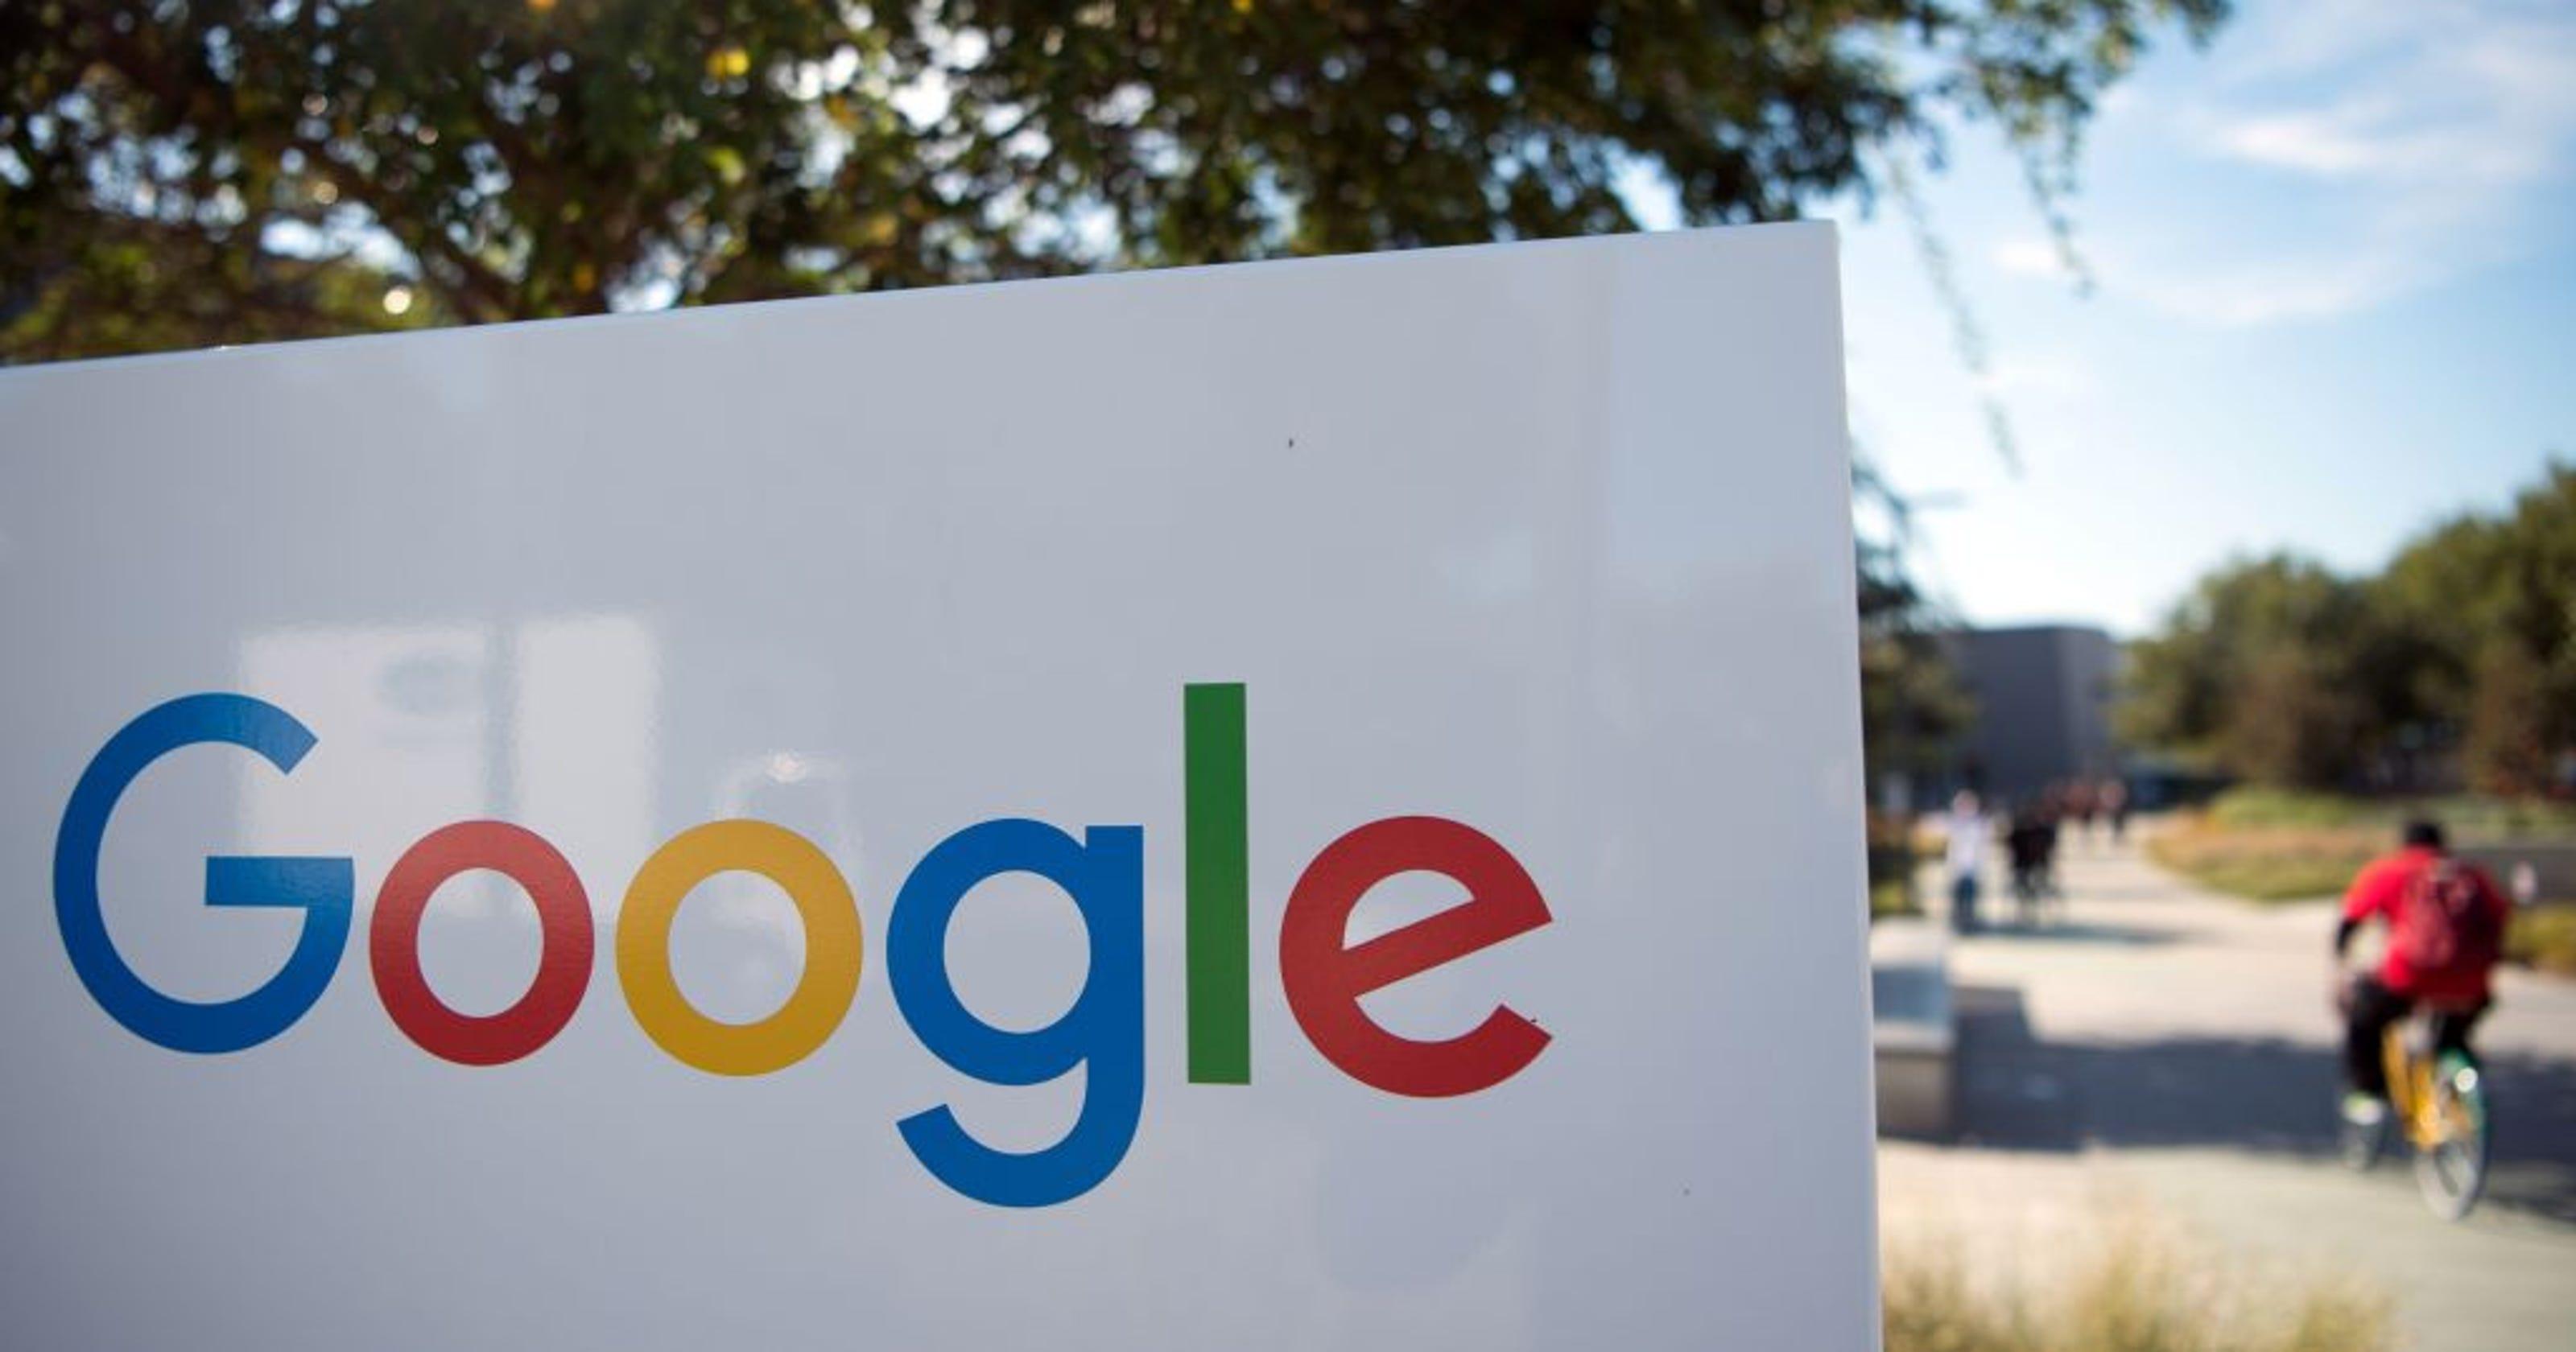 Google Buys Industrial Land Near Tesla Gigafactory East Of Reno